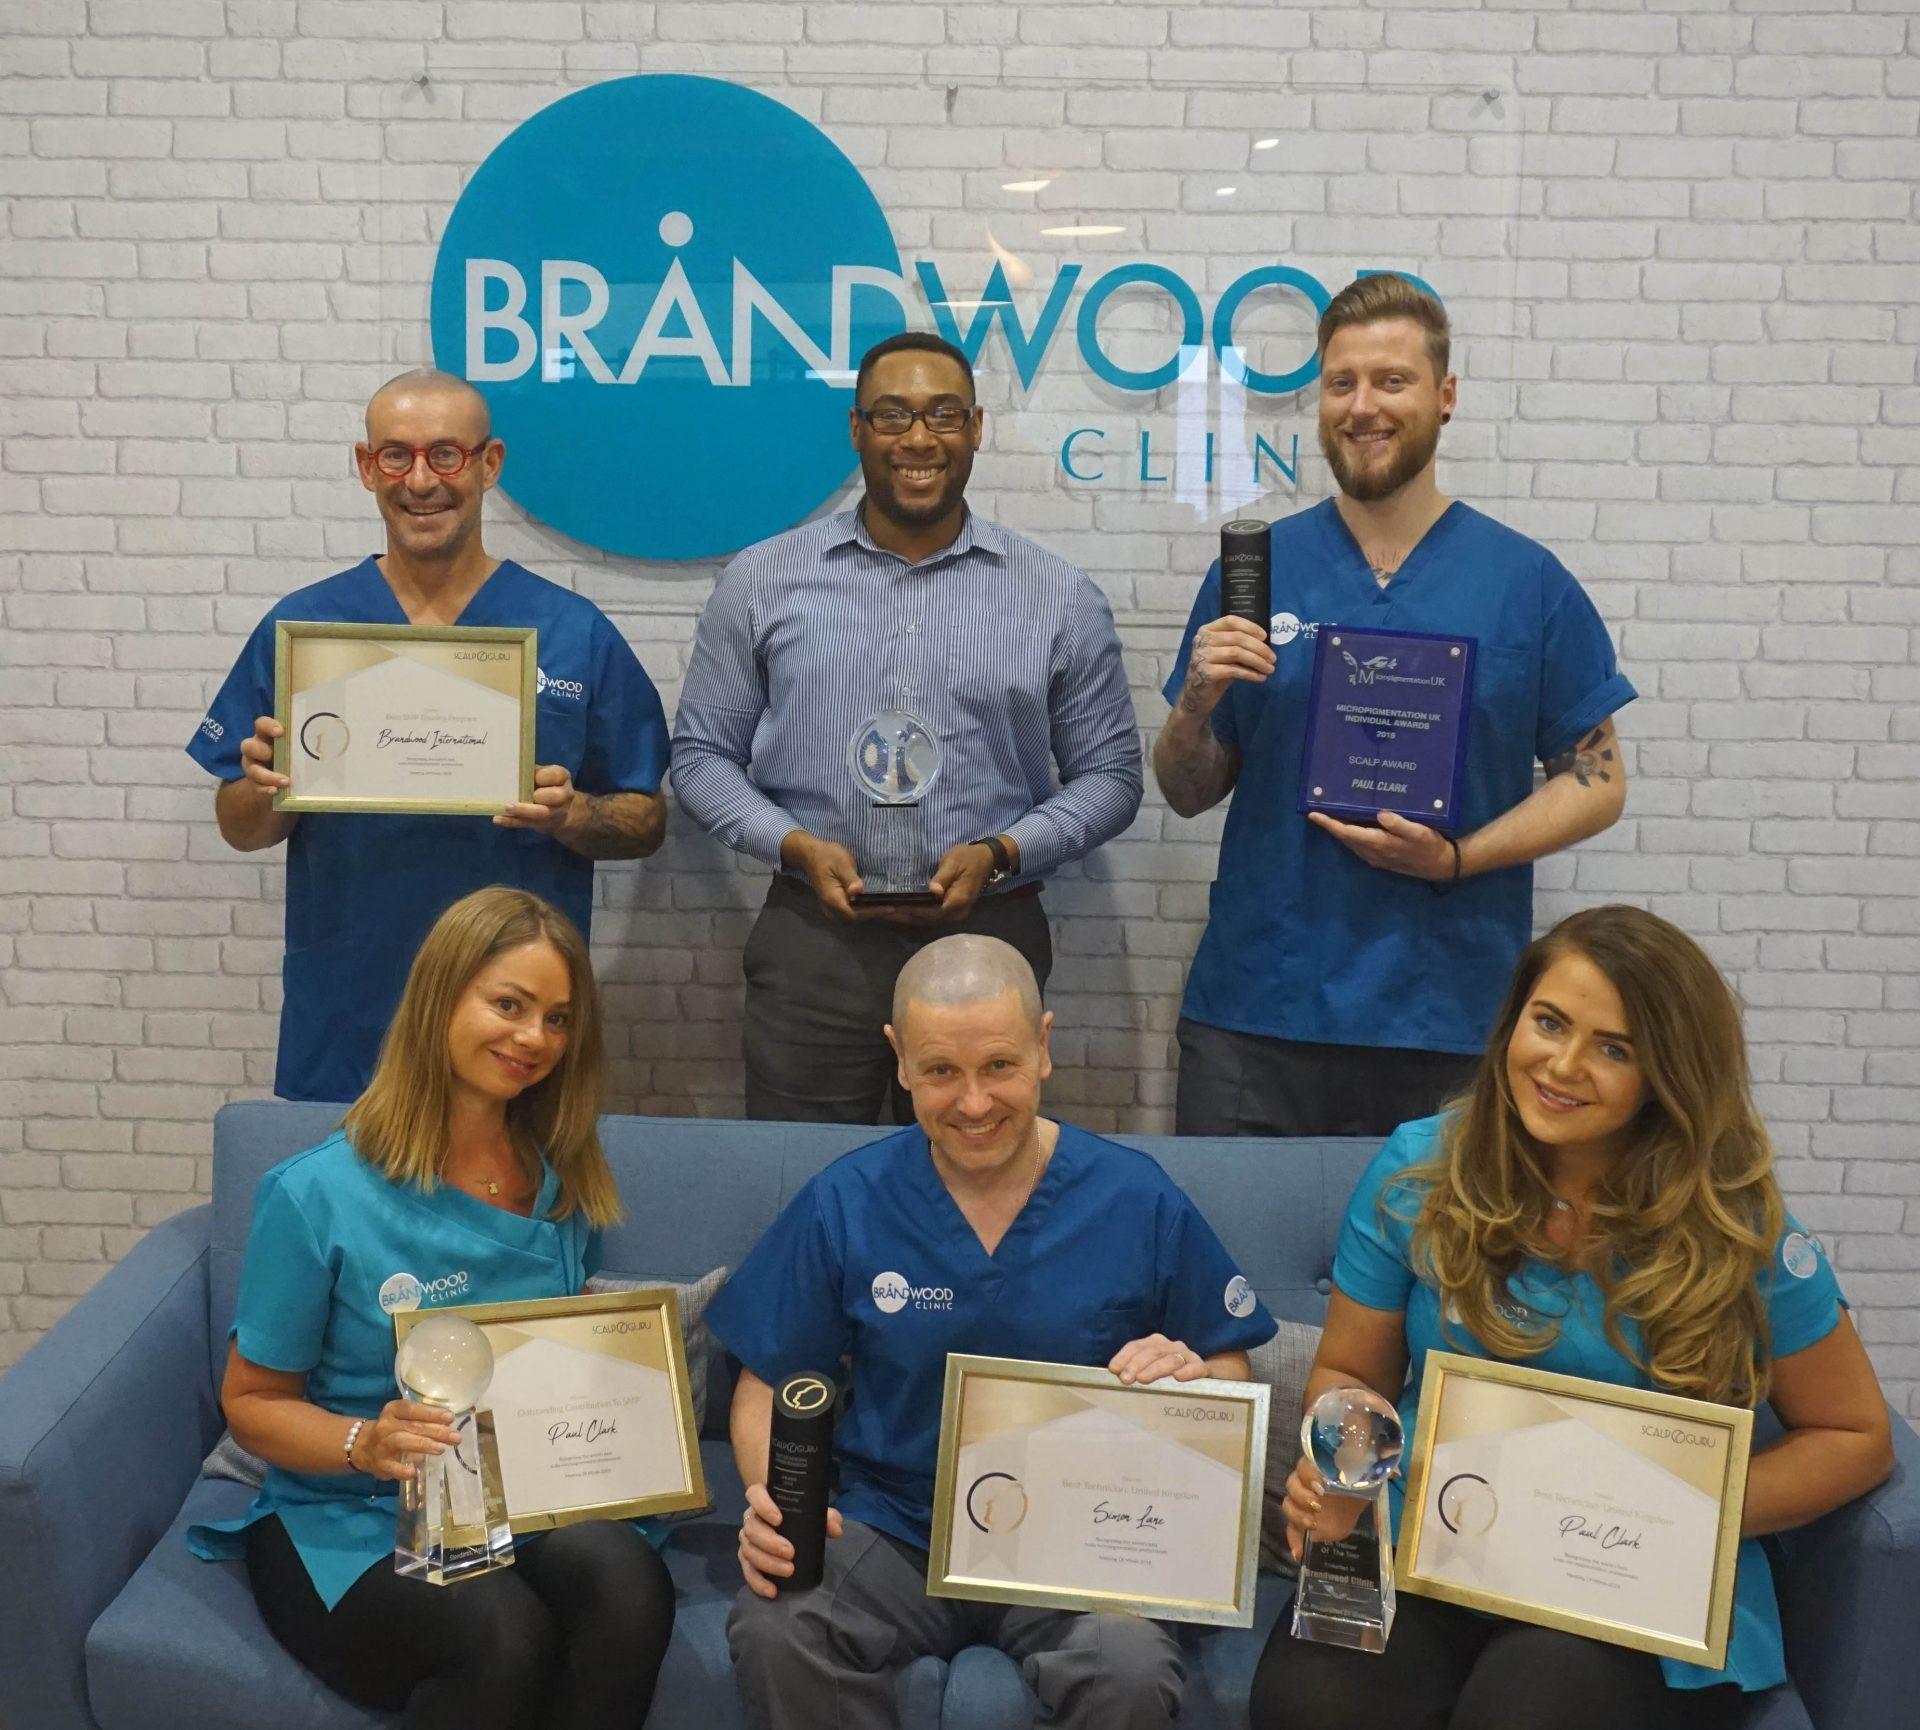 Brandwood Clinic awards